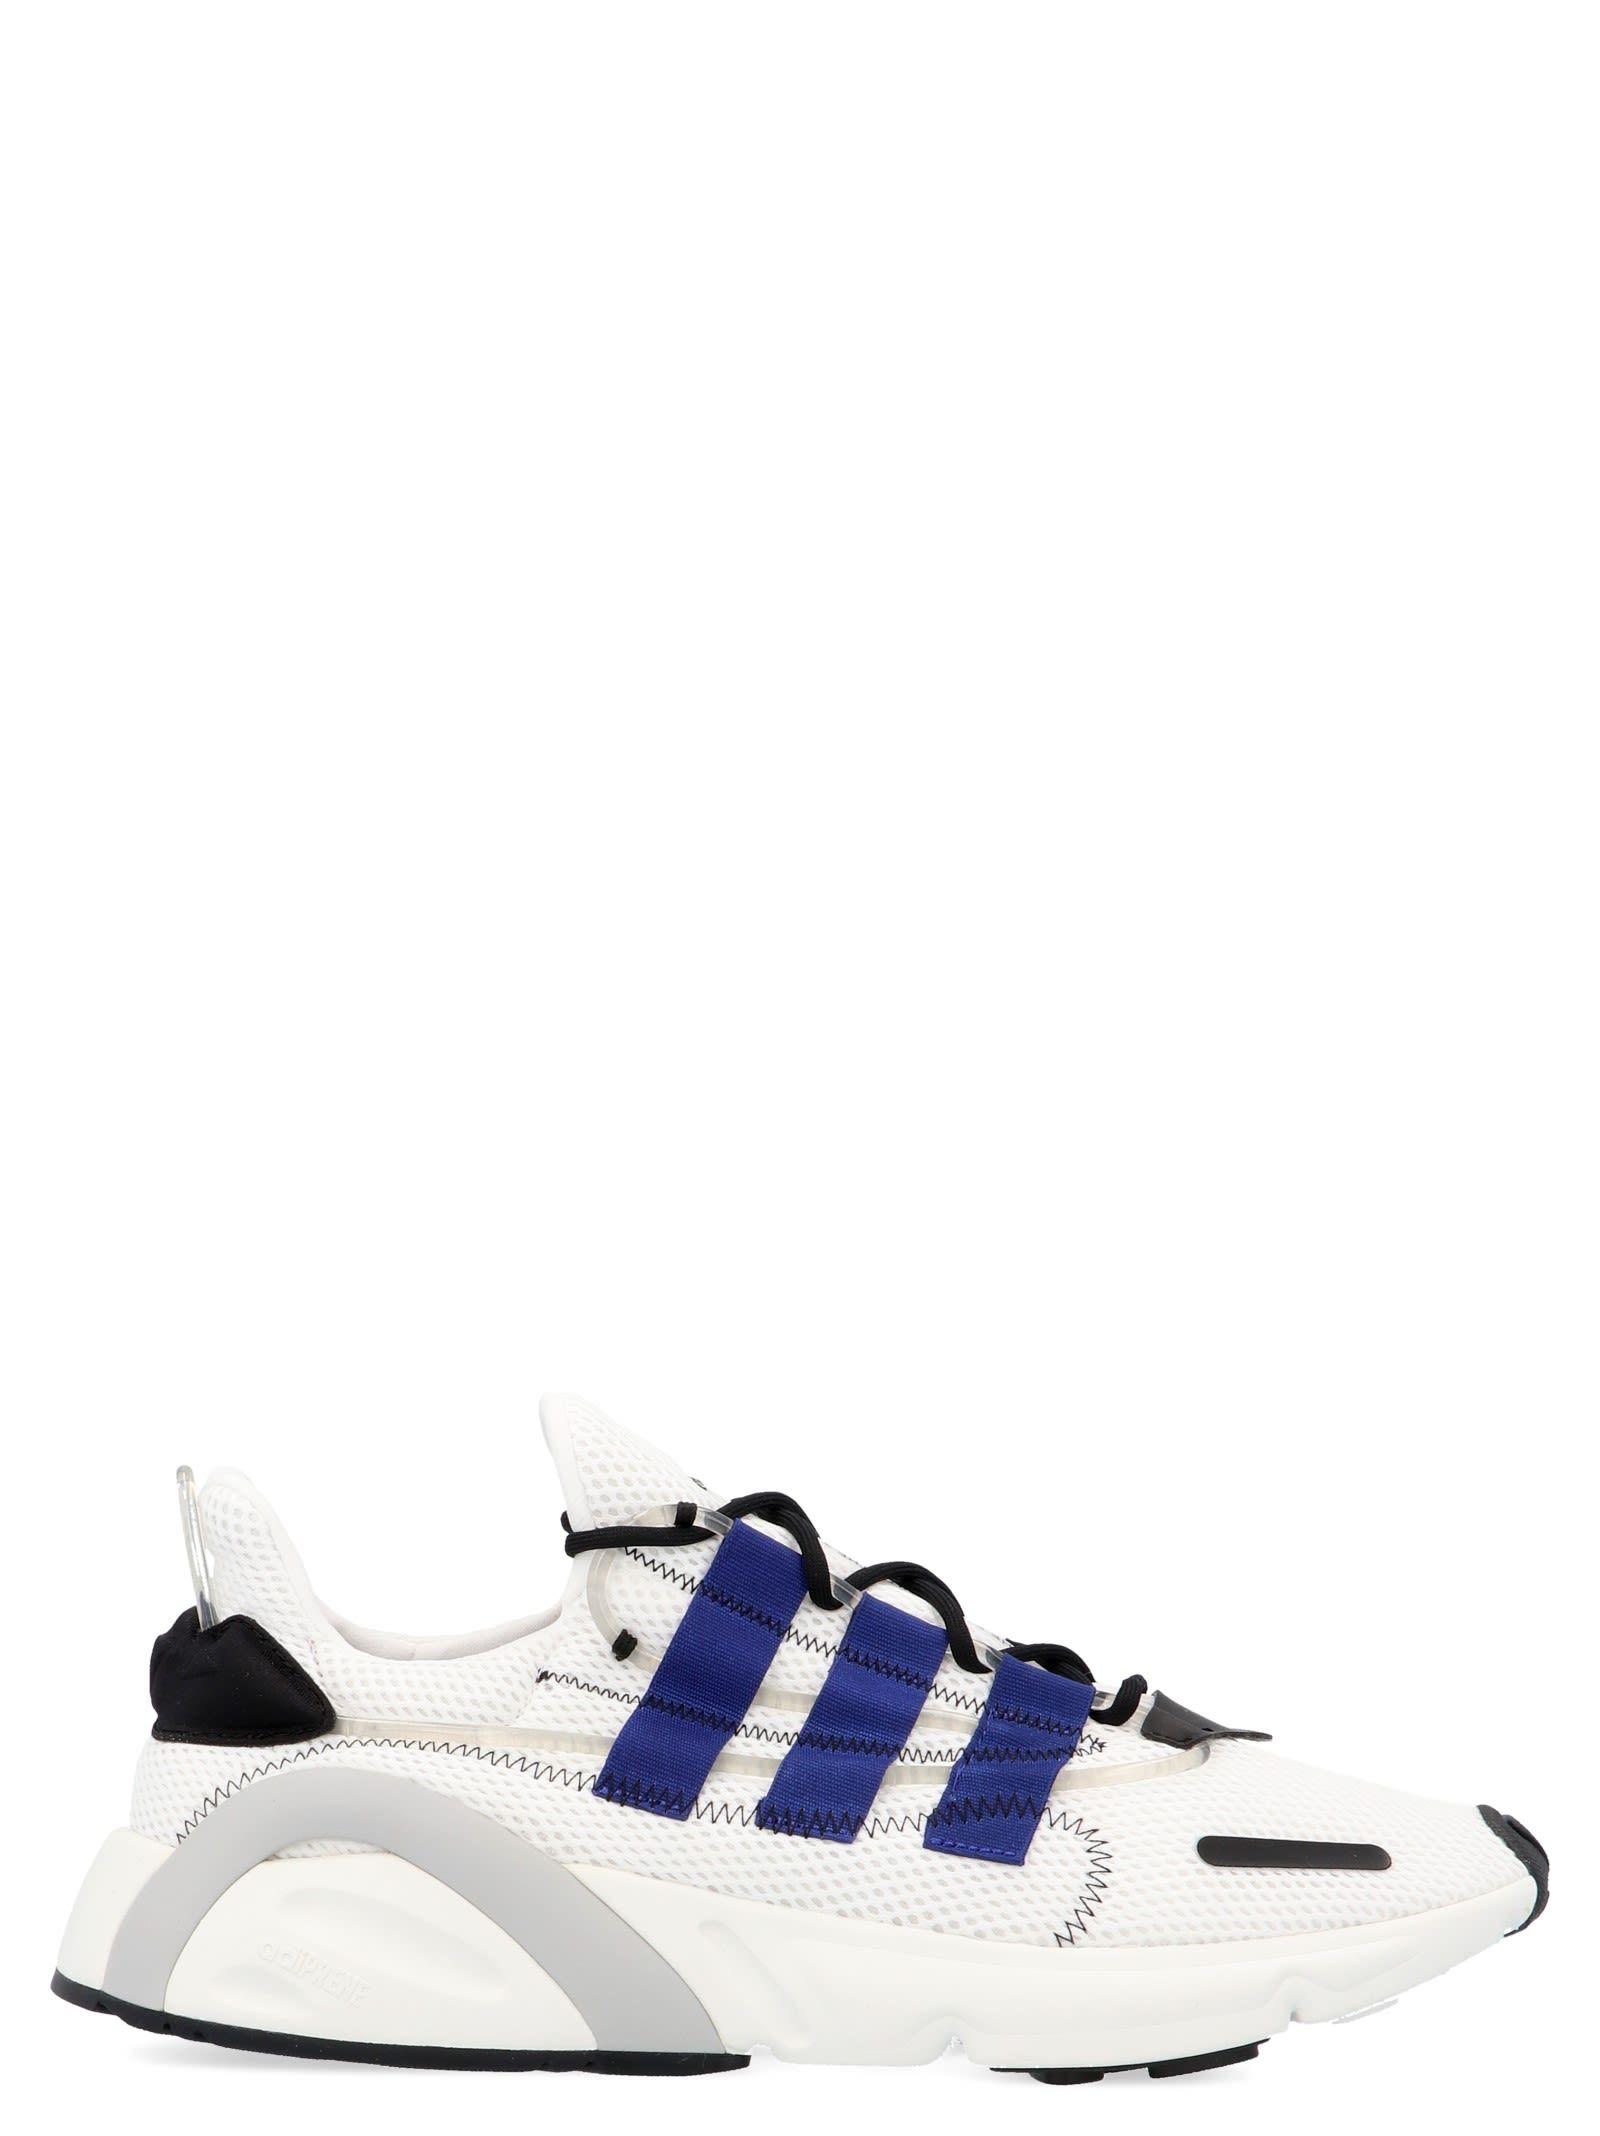 Adidas Originals Adidas Lx Adiprene